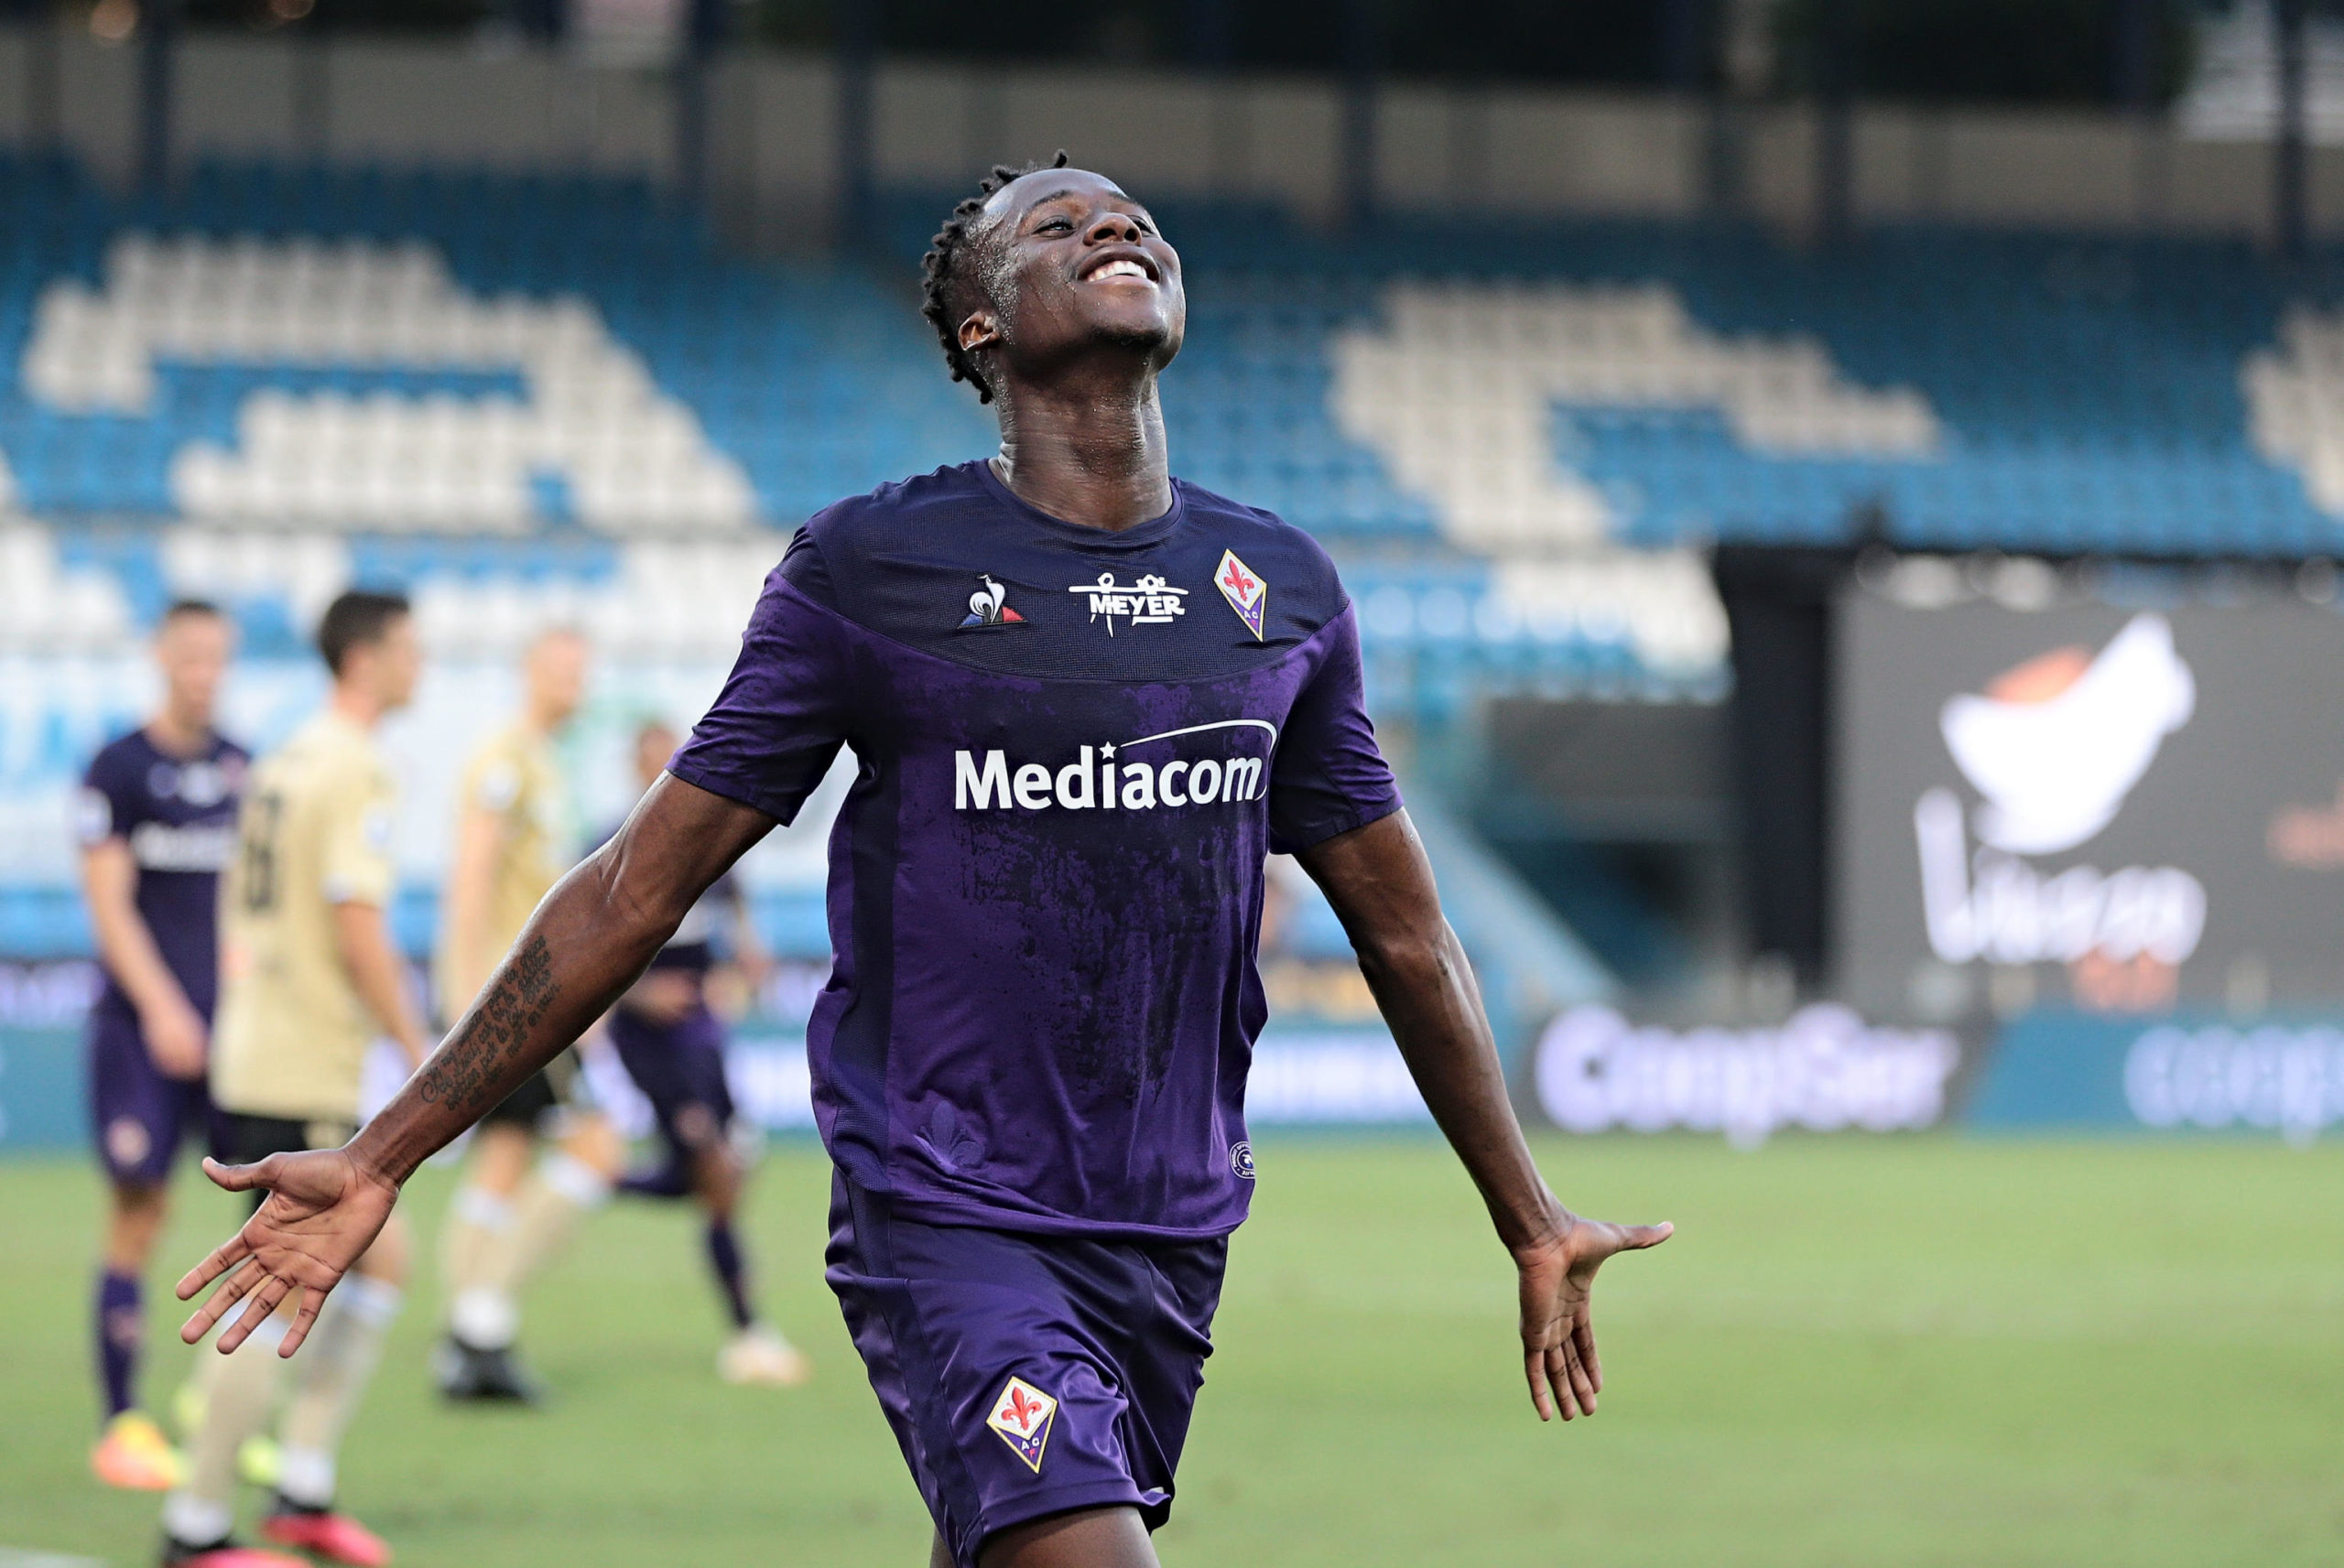 Fiorentina's Christian Kouame celebrates a goal against SPAL